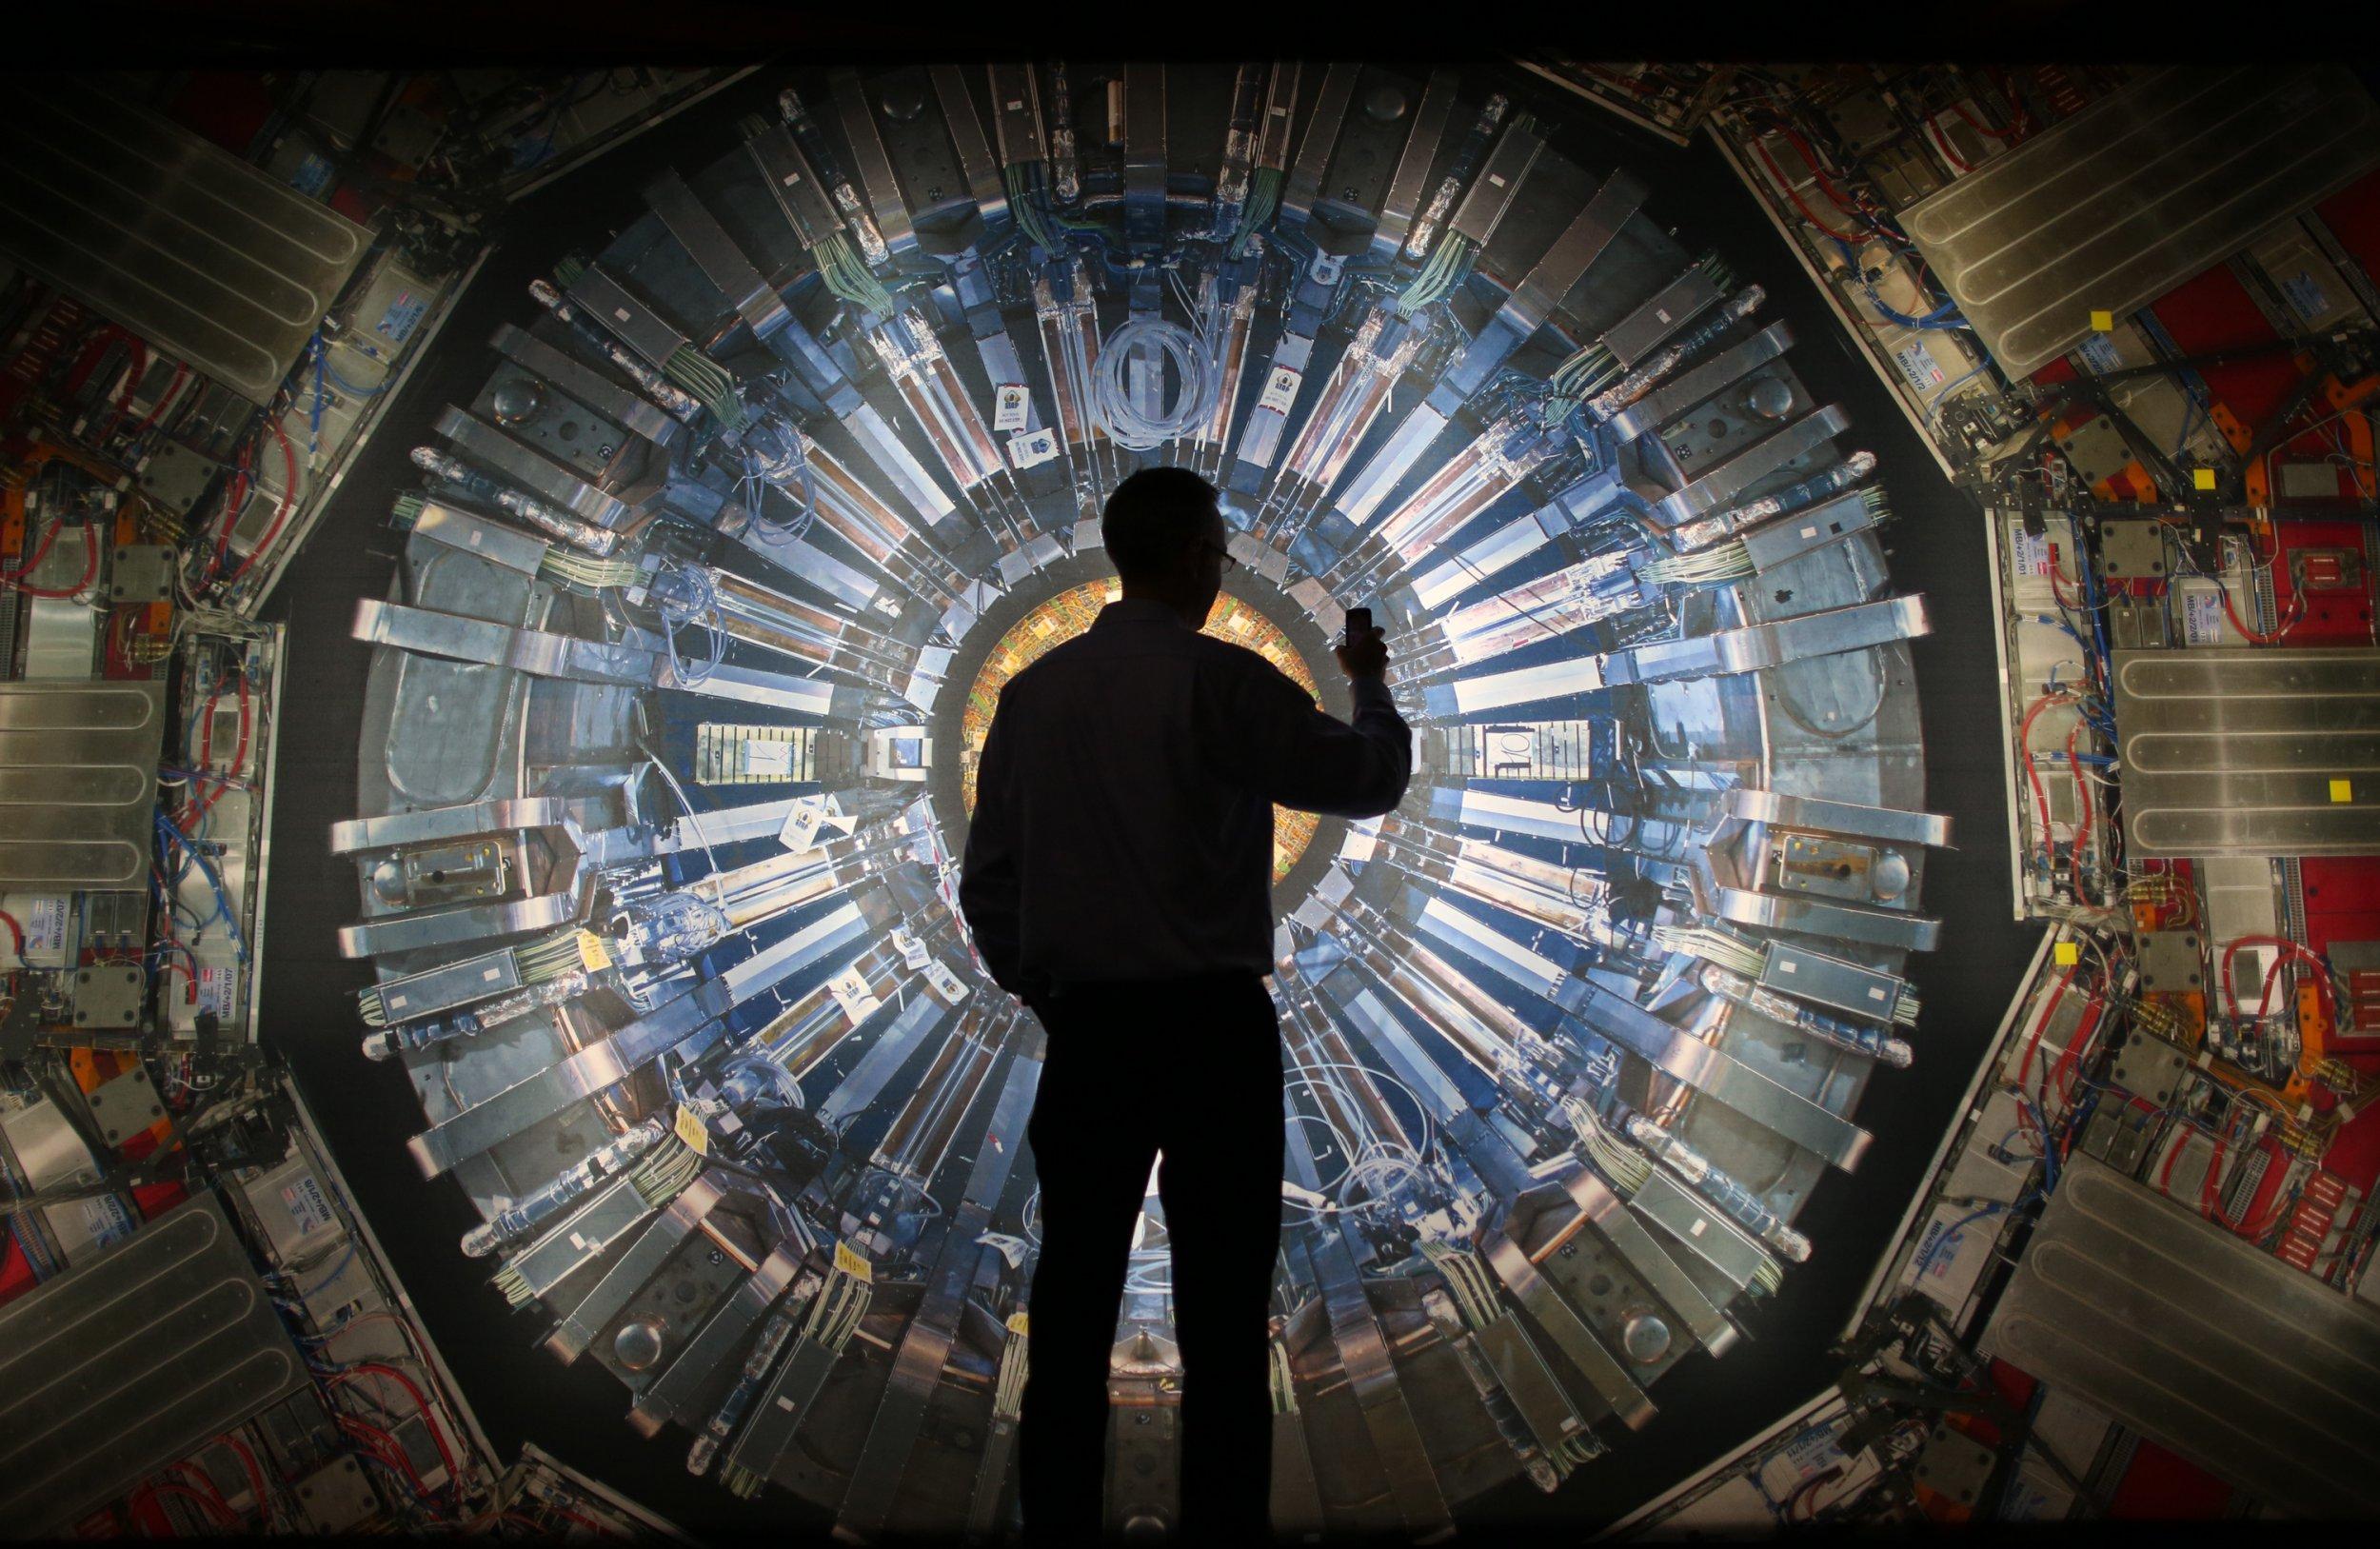 11_03_large_hadron_collider